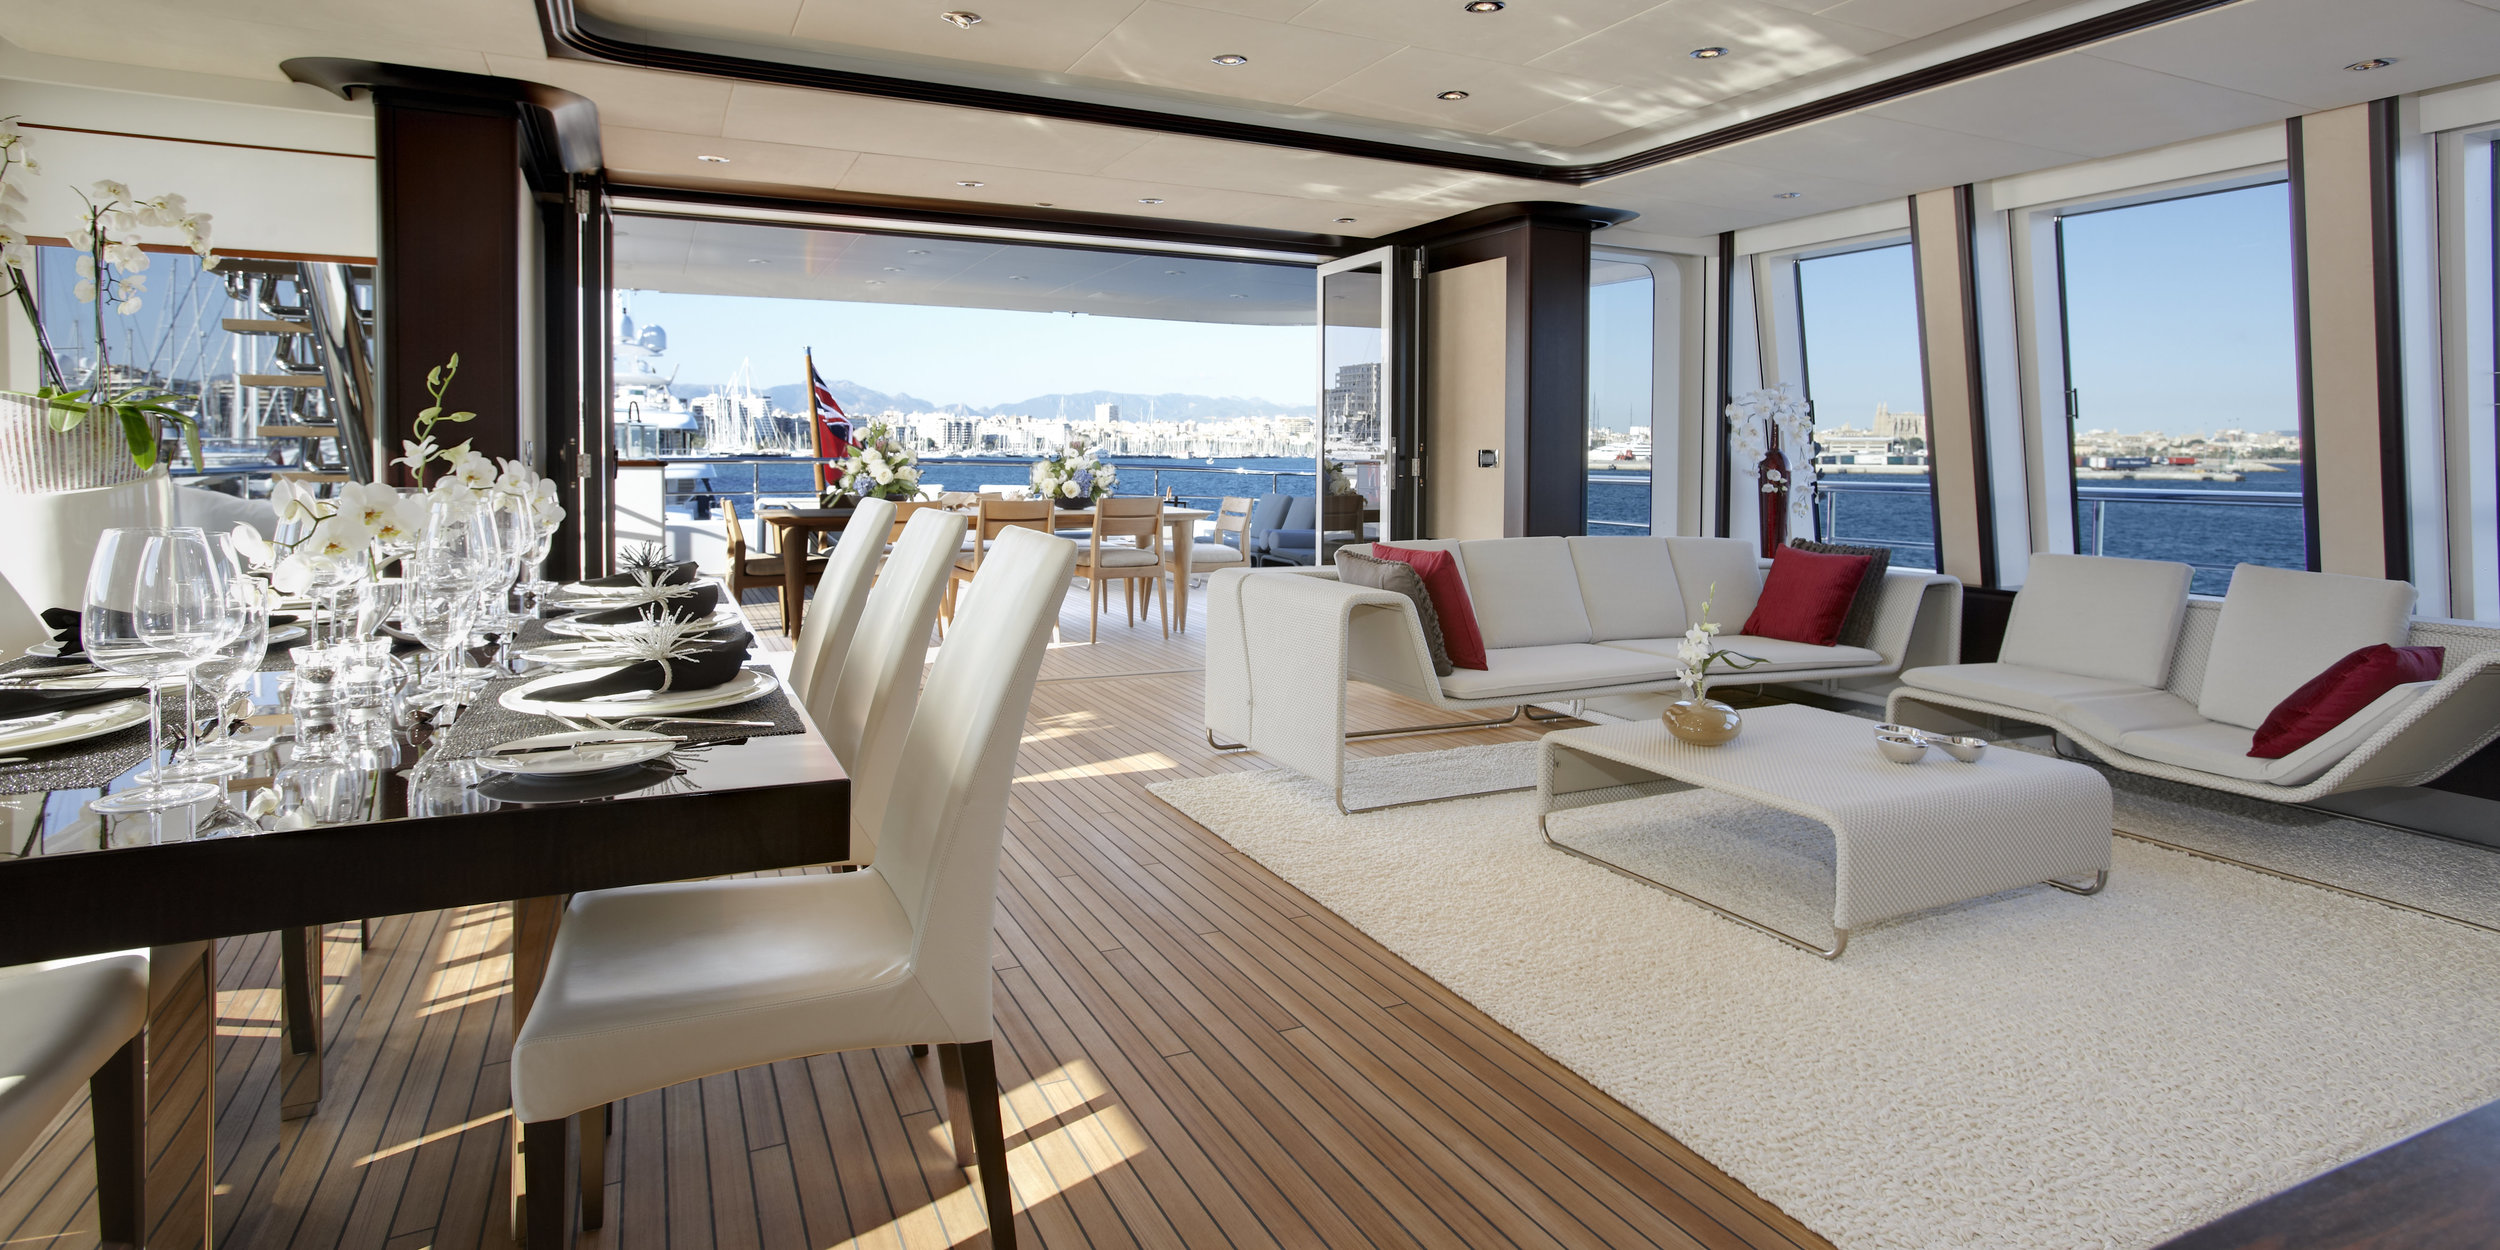 The-Helix-Superyacht-Bridge-Deck-Lounge.jpg..jpg